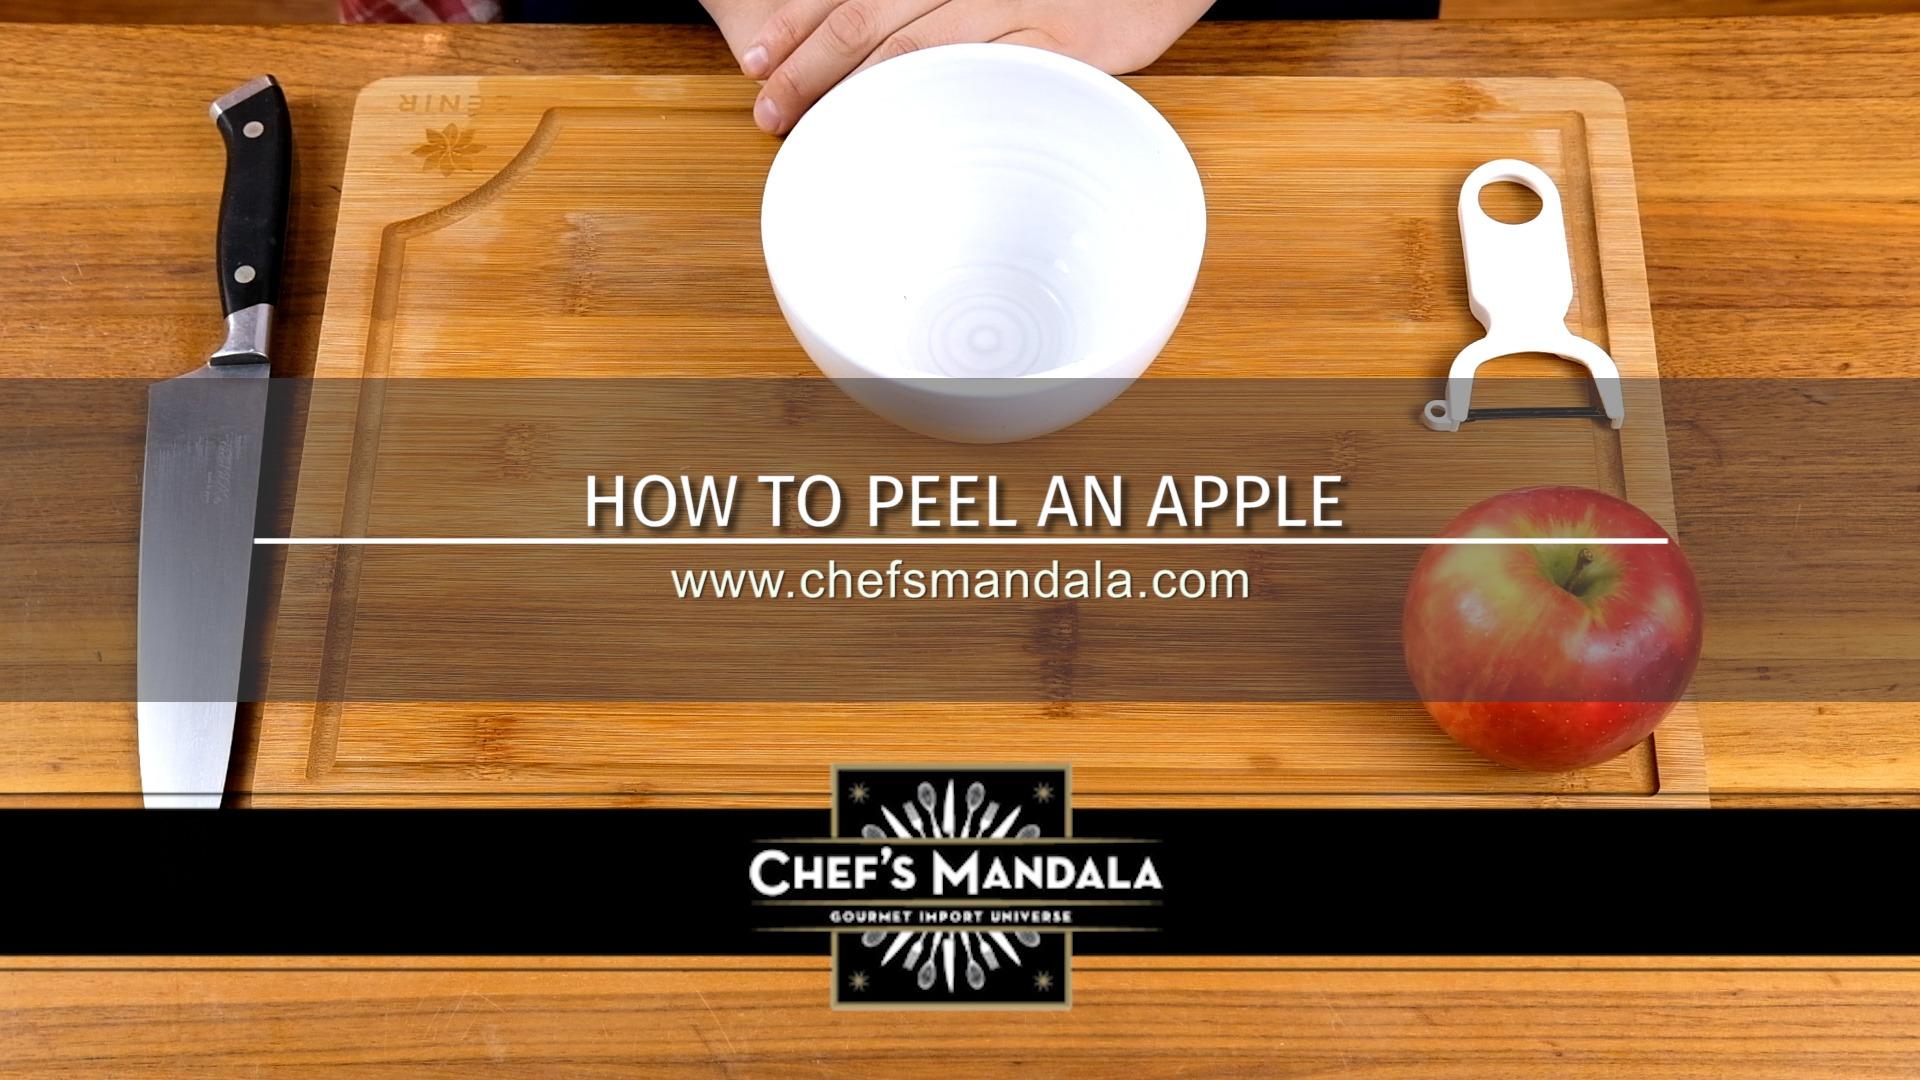 HOW TO PEEL AN APPLE